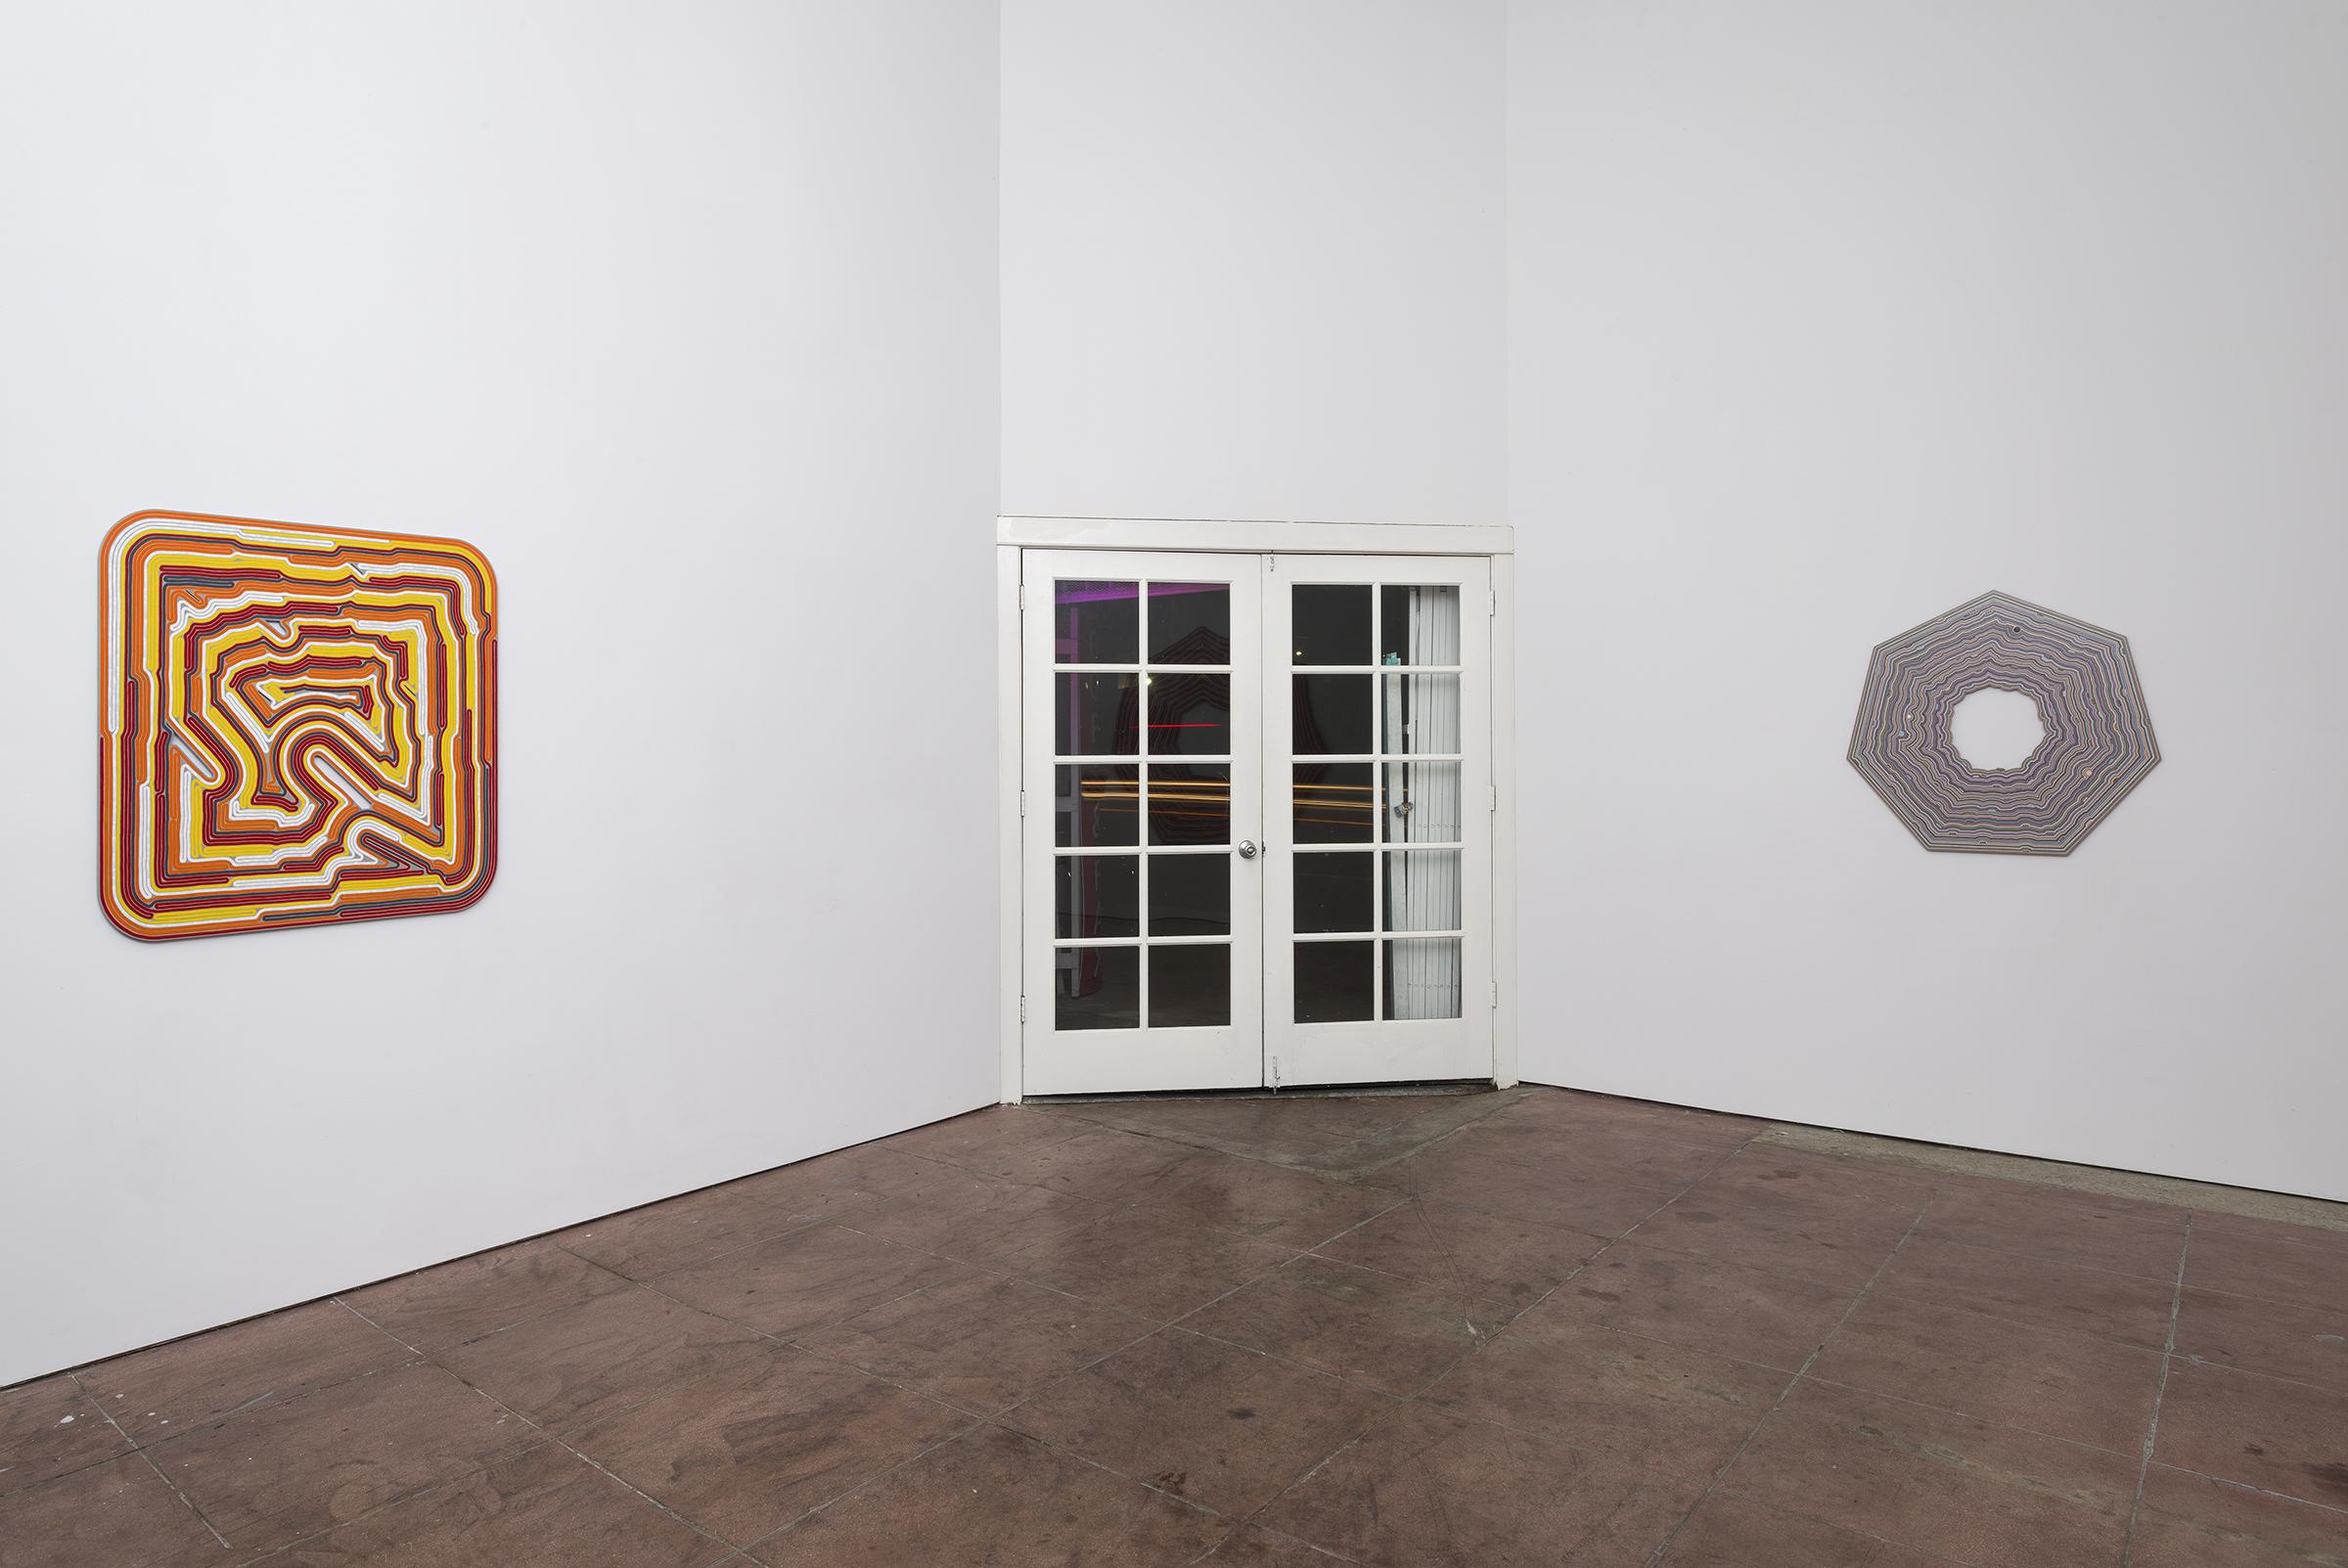 Installation view, The True Organization of Things ,Martos Gallery, Los Angeles, 2016